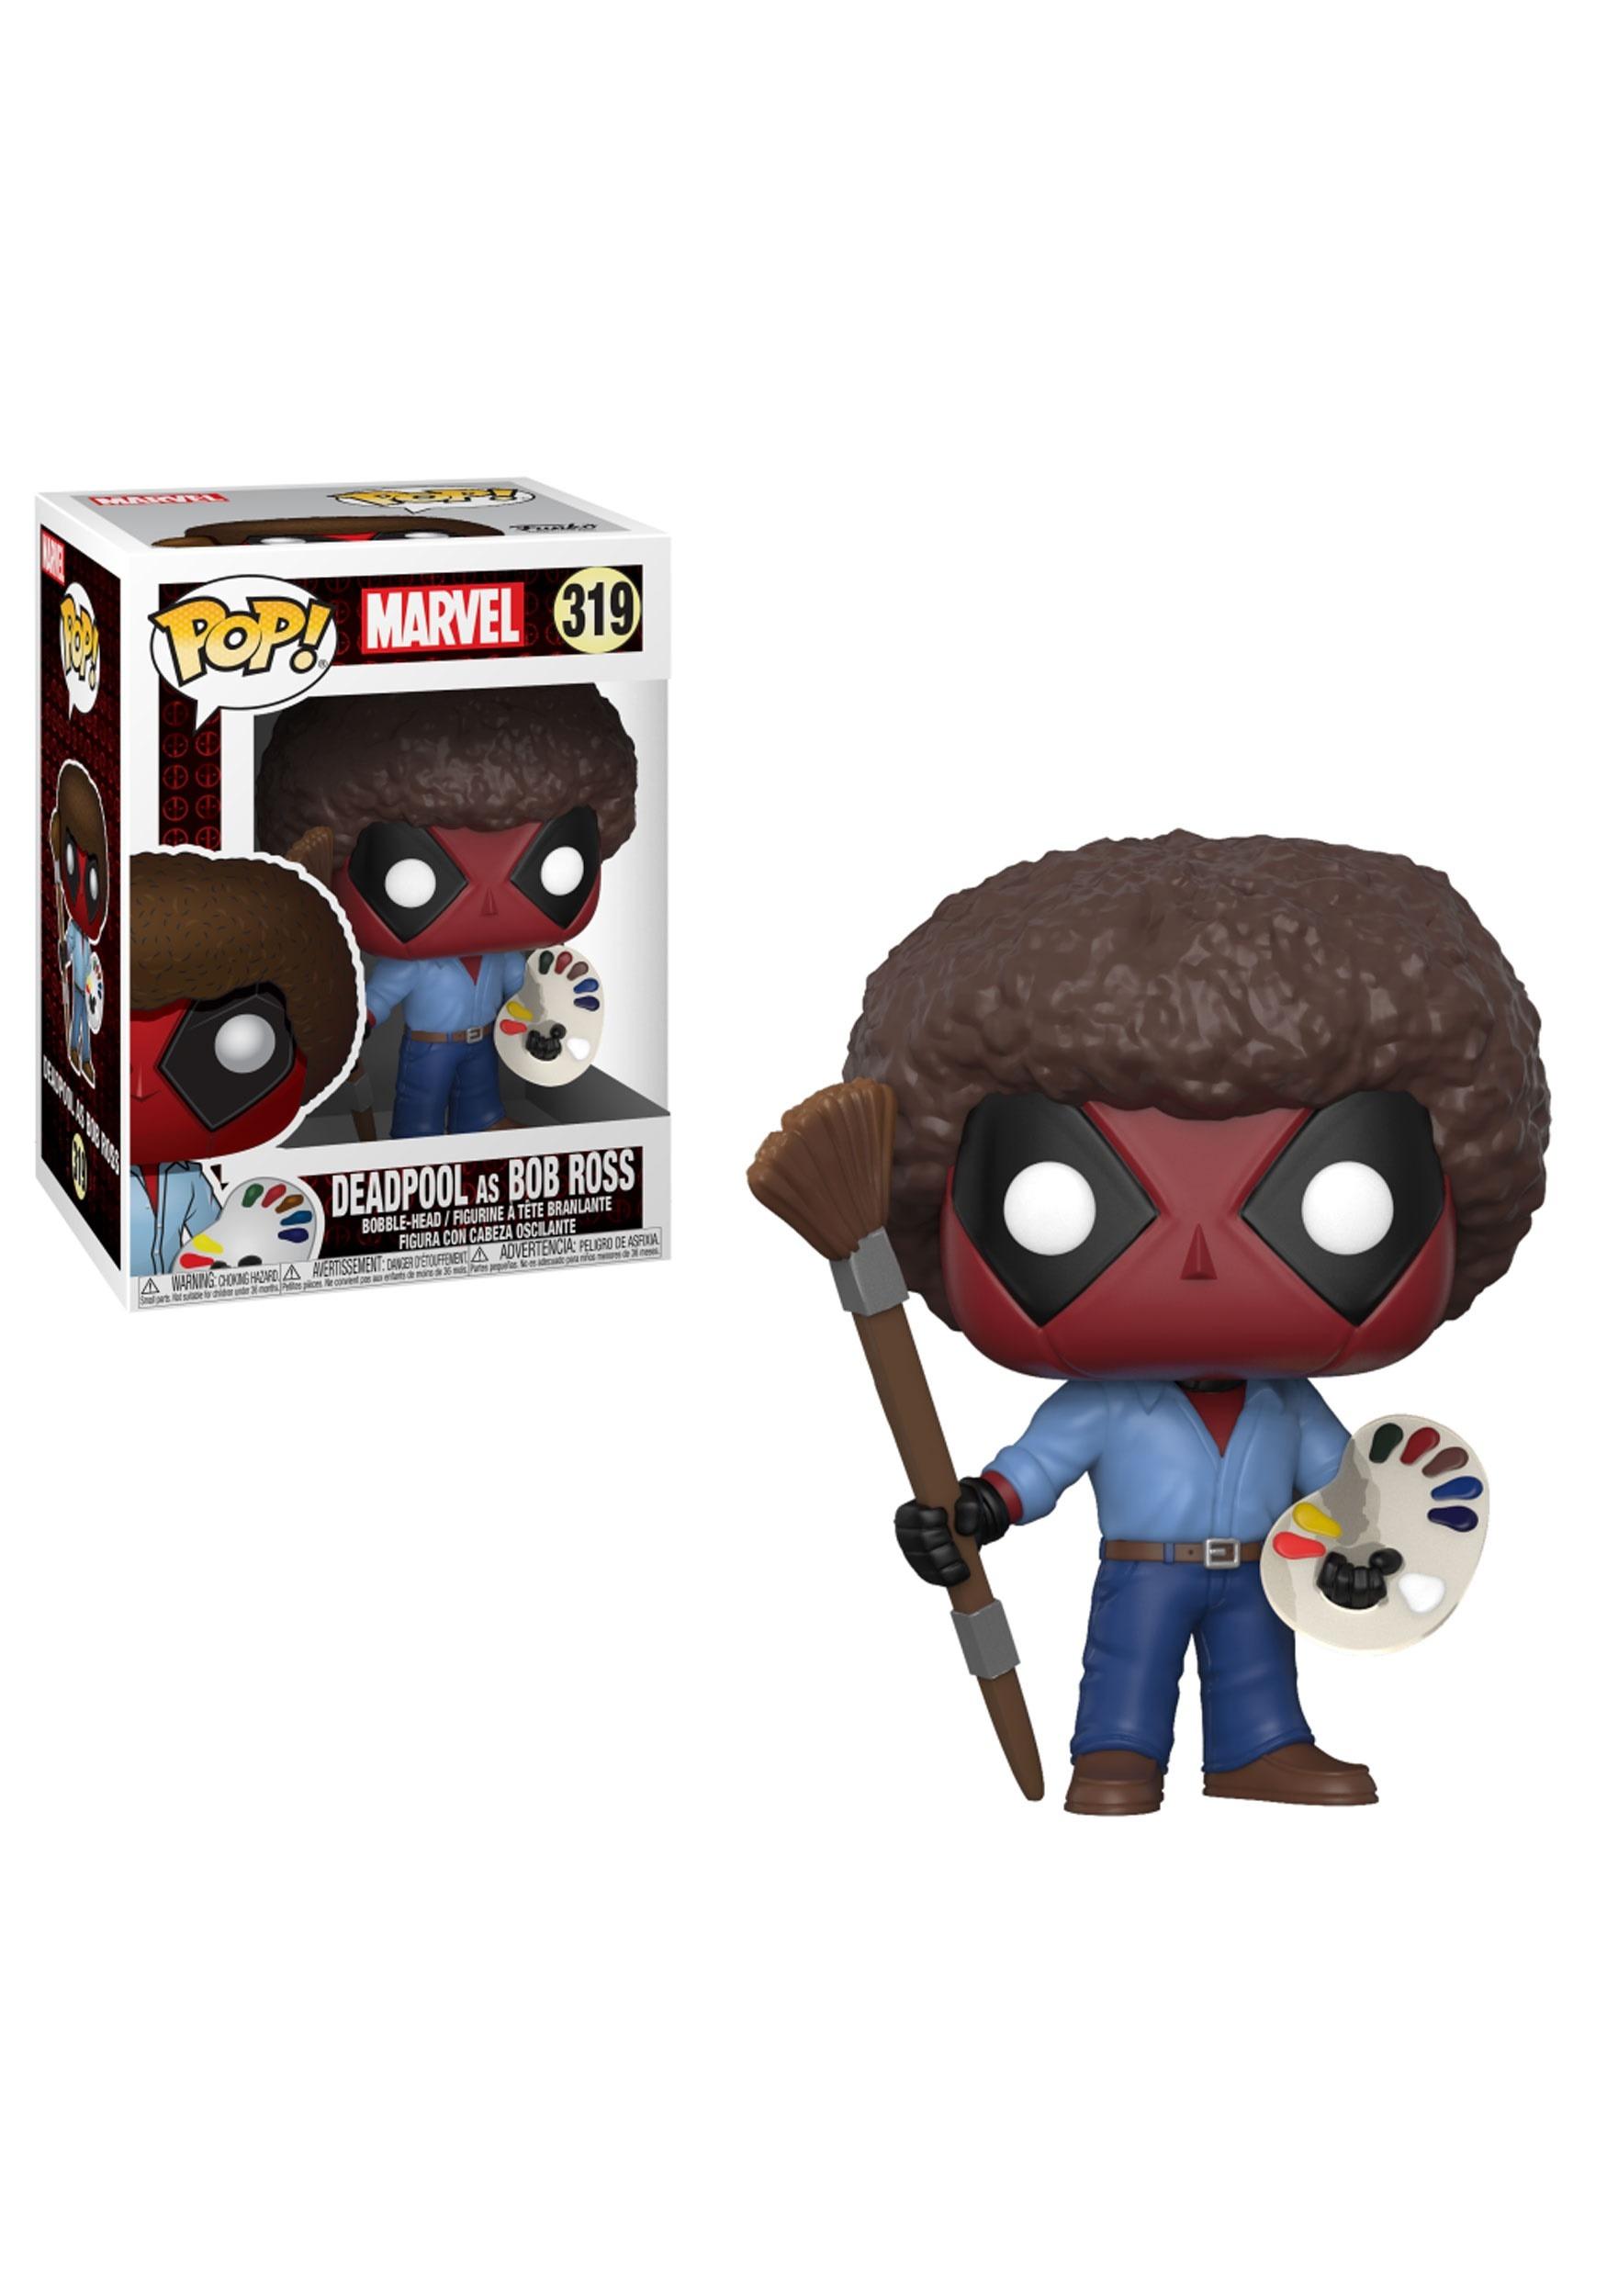 Marvel Deadpool as Bob Ross POP! Bobblehead Figure